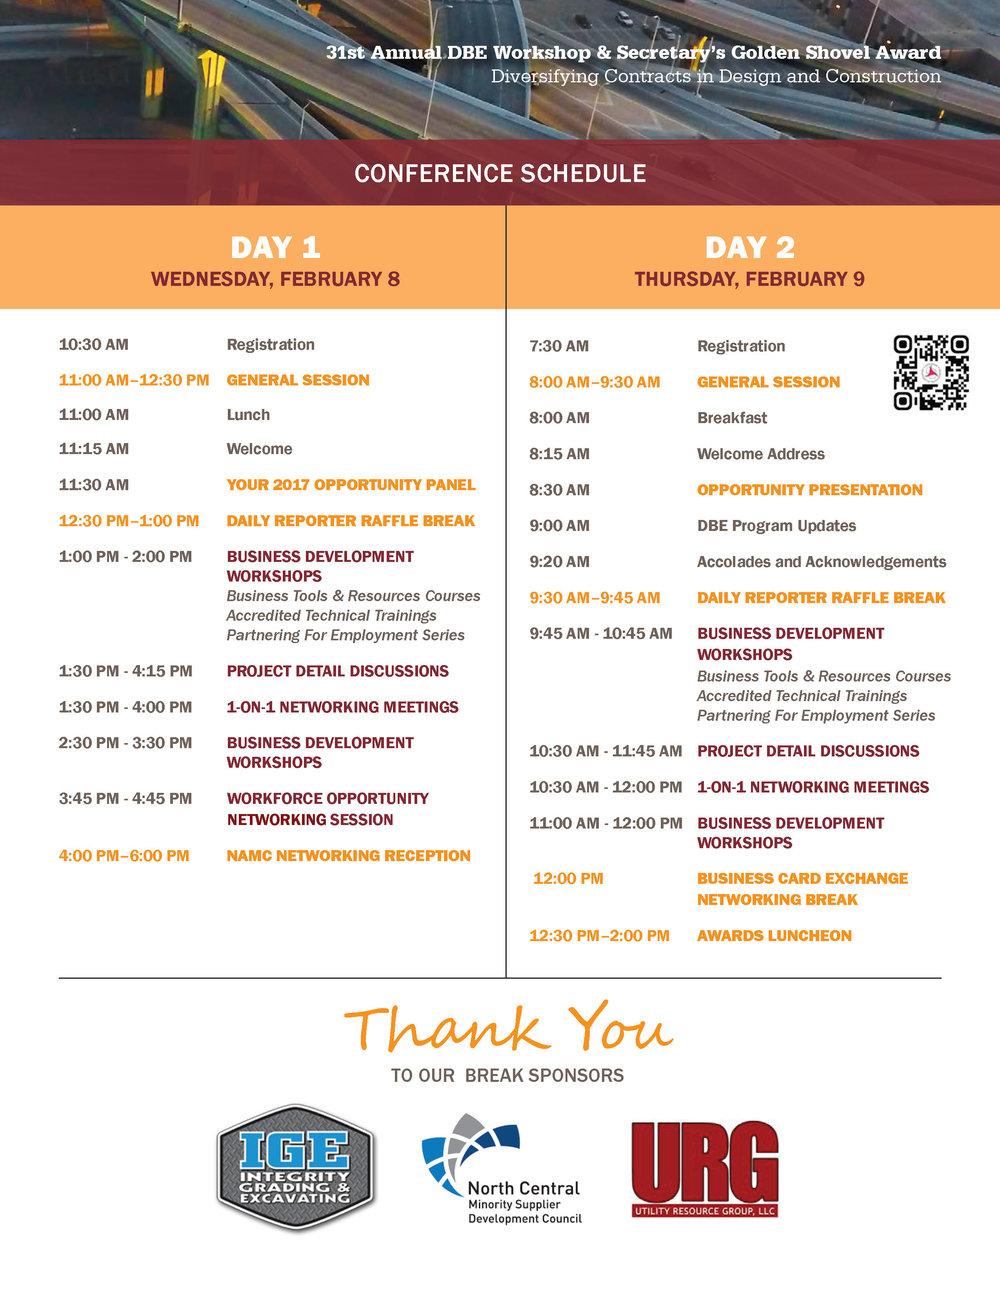 31st Annual Event Agenda — Golden Shovel WI Conference